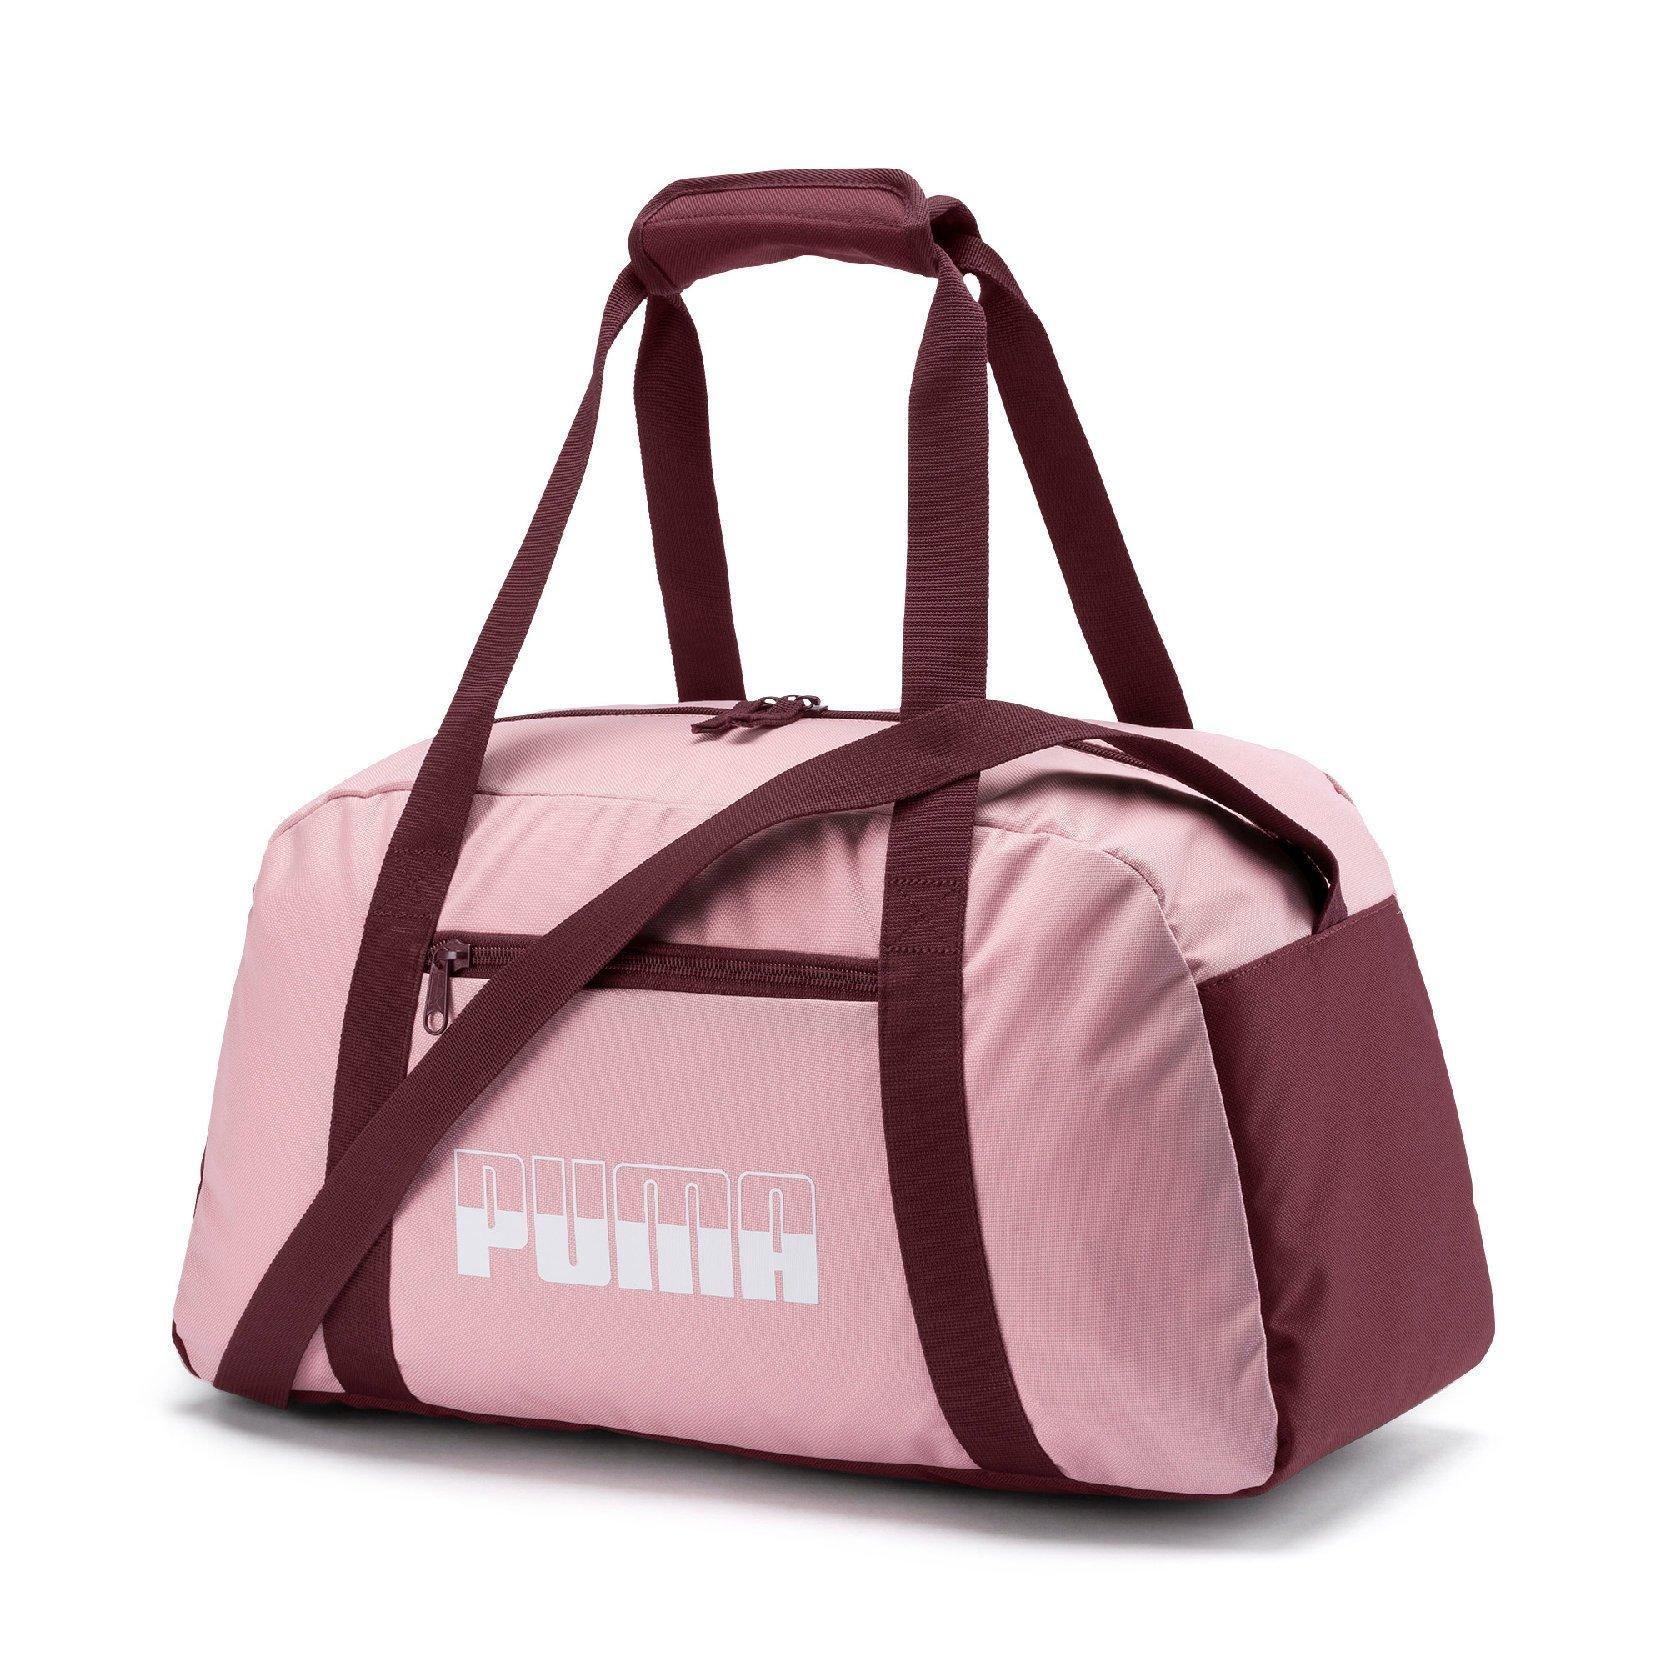 e7890eac4c1 Spordikott Puma Plus II, 25 l, roosa